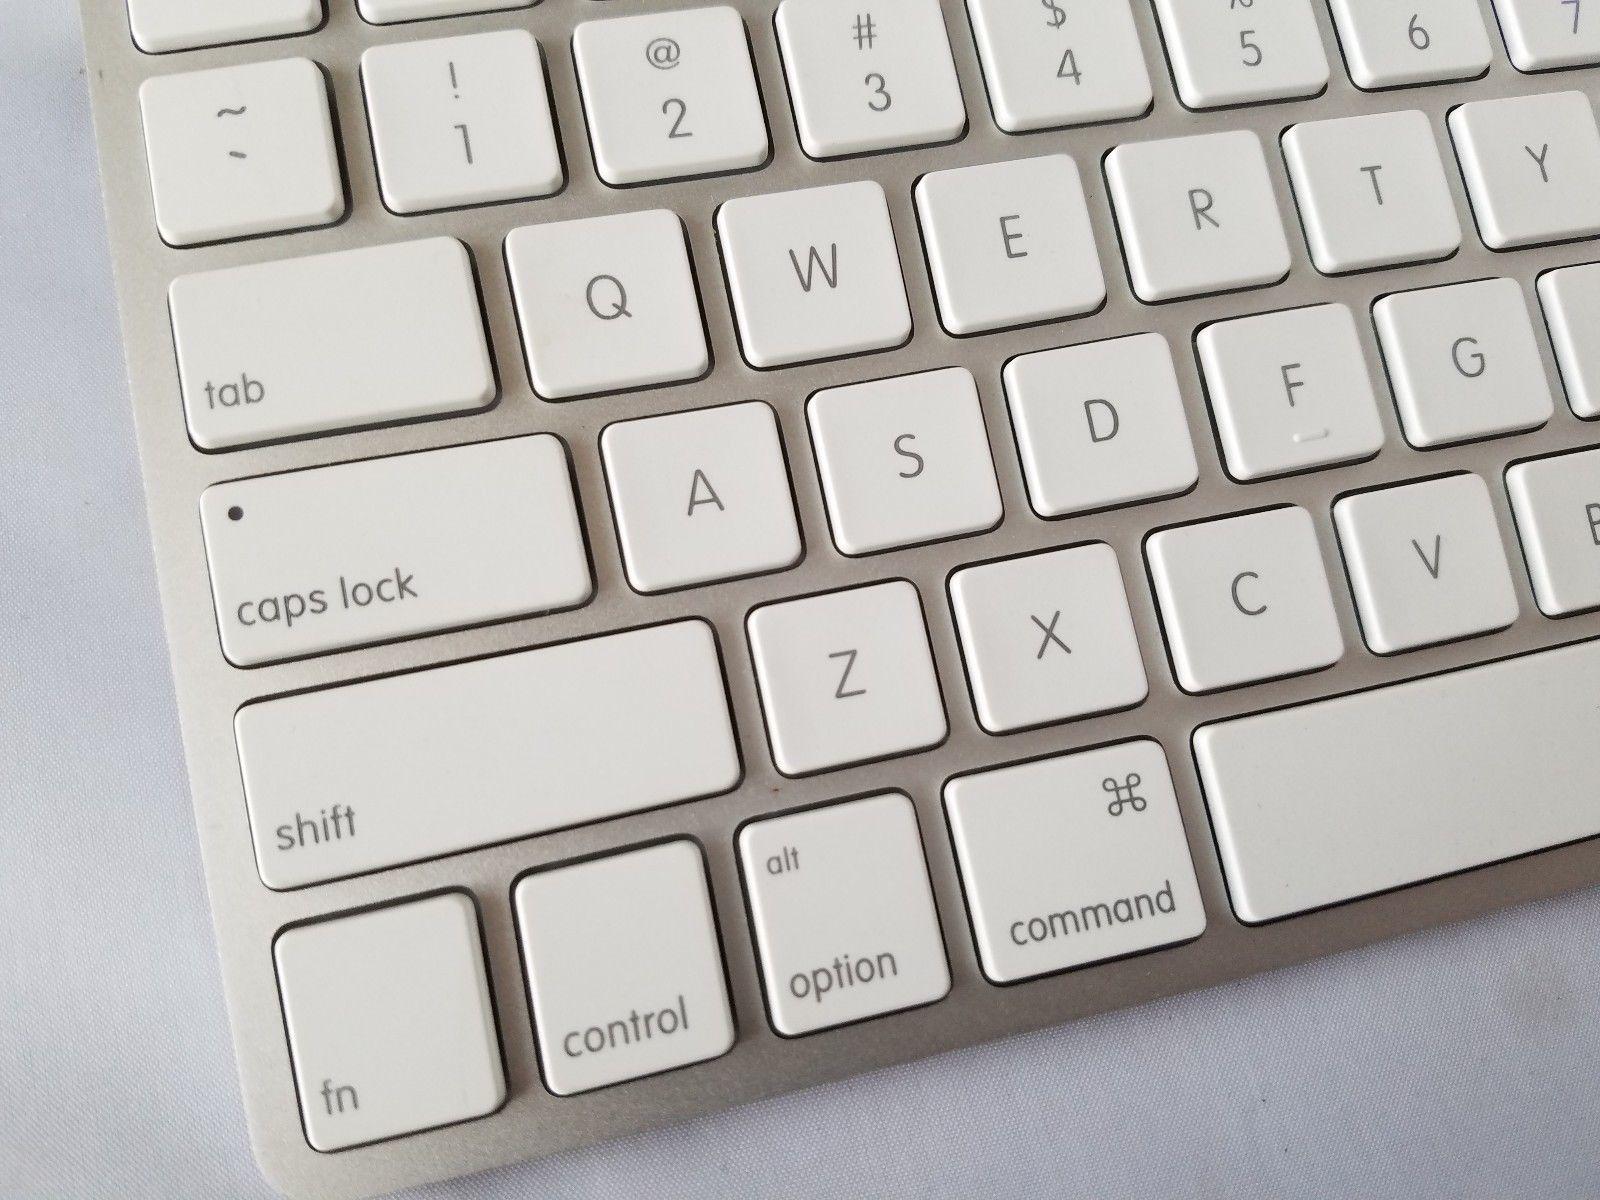 896a5d98d4e Apple A1314 MC184LL/B Wireless Keyboard Mac and 50 similar items